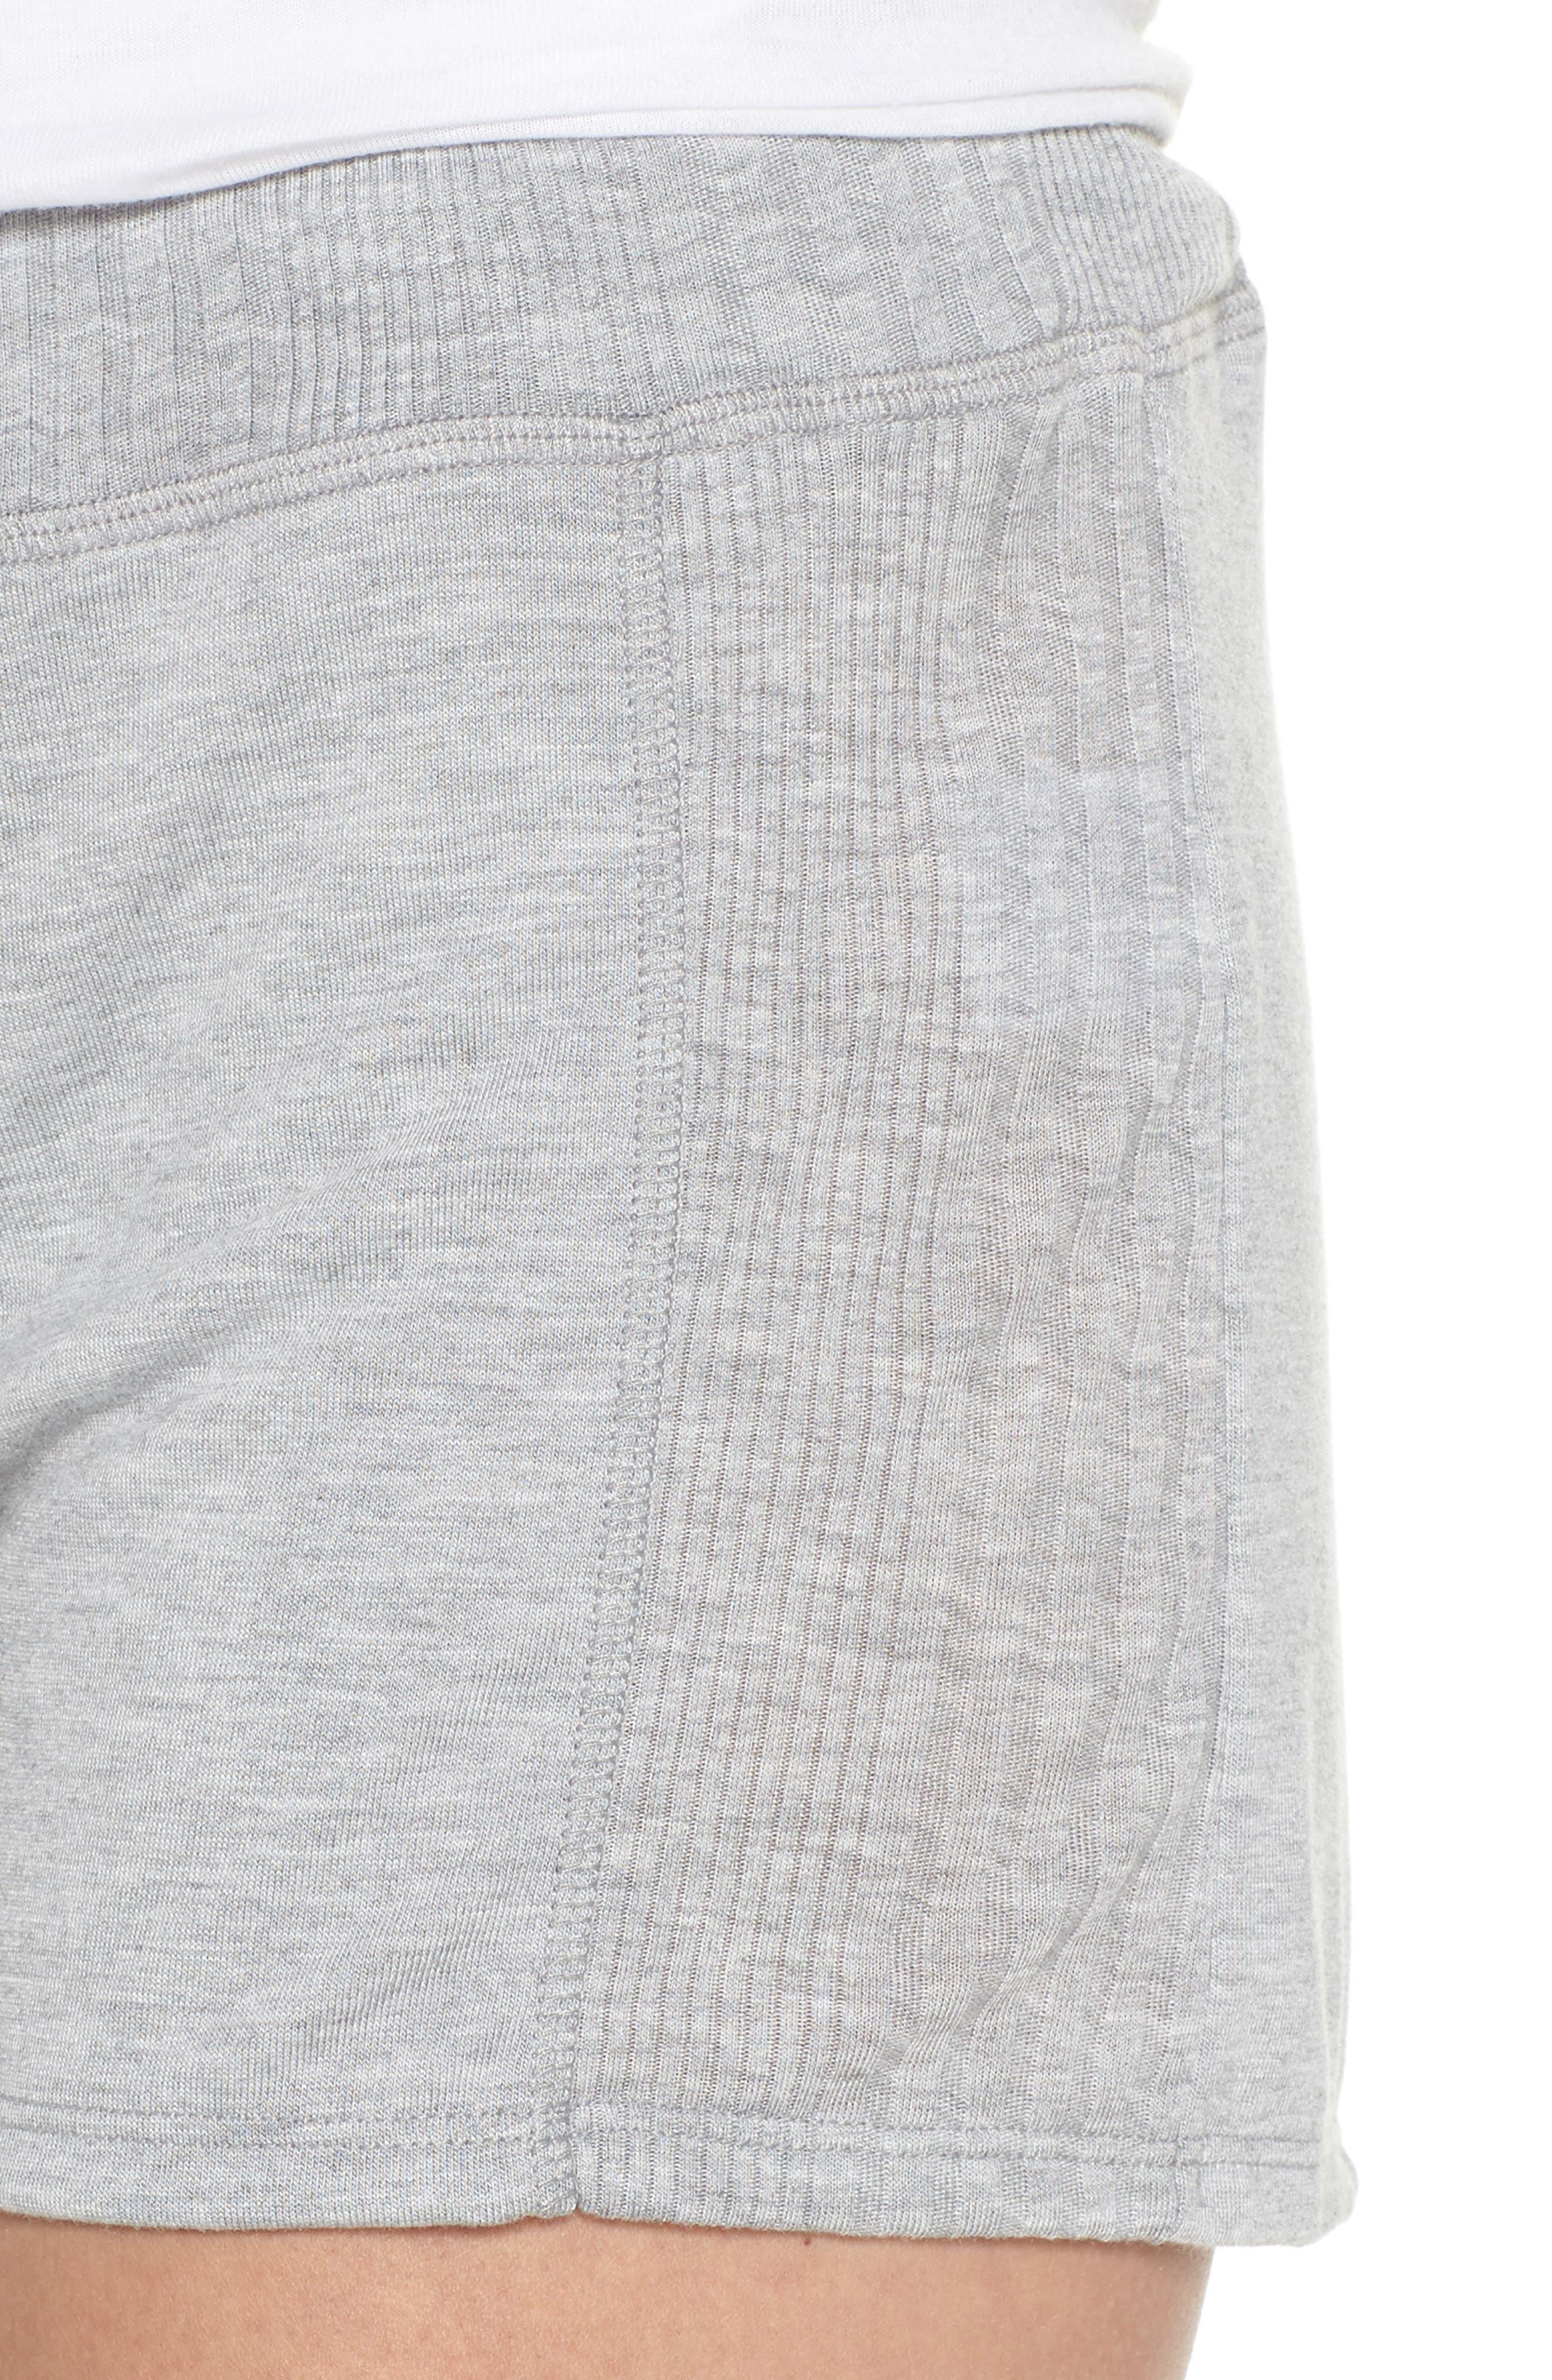 Pajama Shorts,                             Alternate thumbnail 4, color,                             LIGHT HEATHER GREY